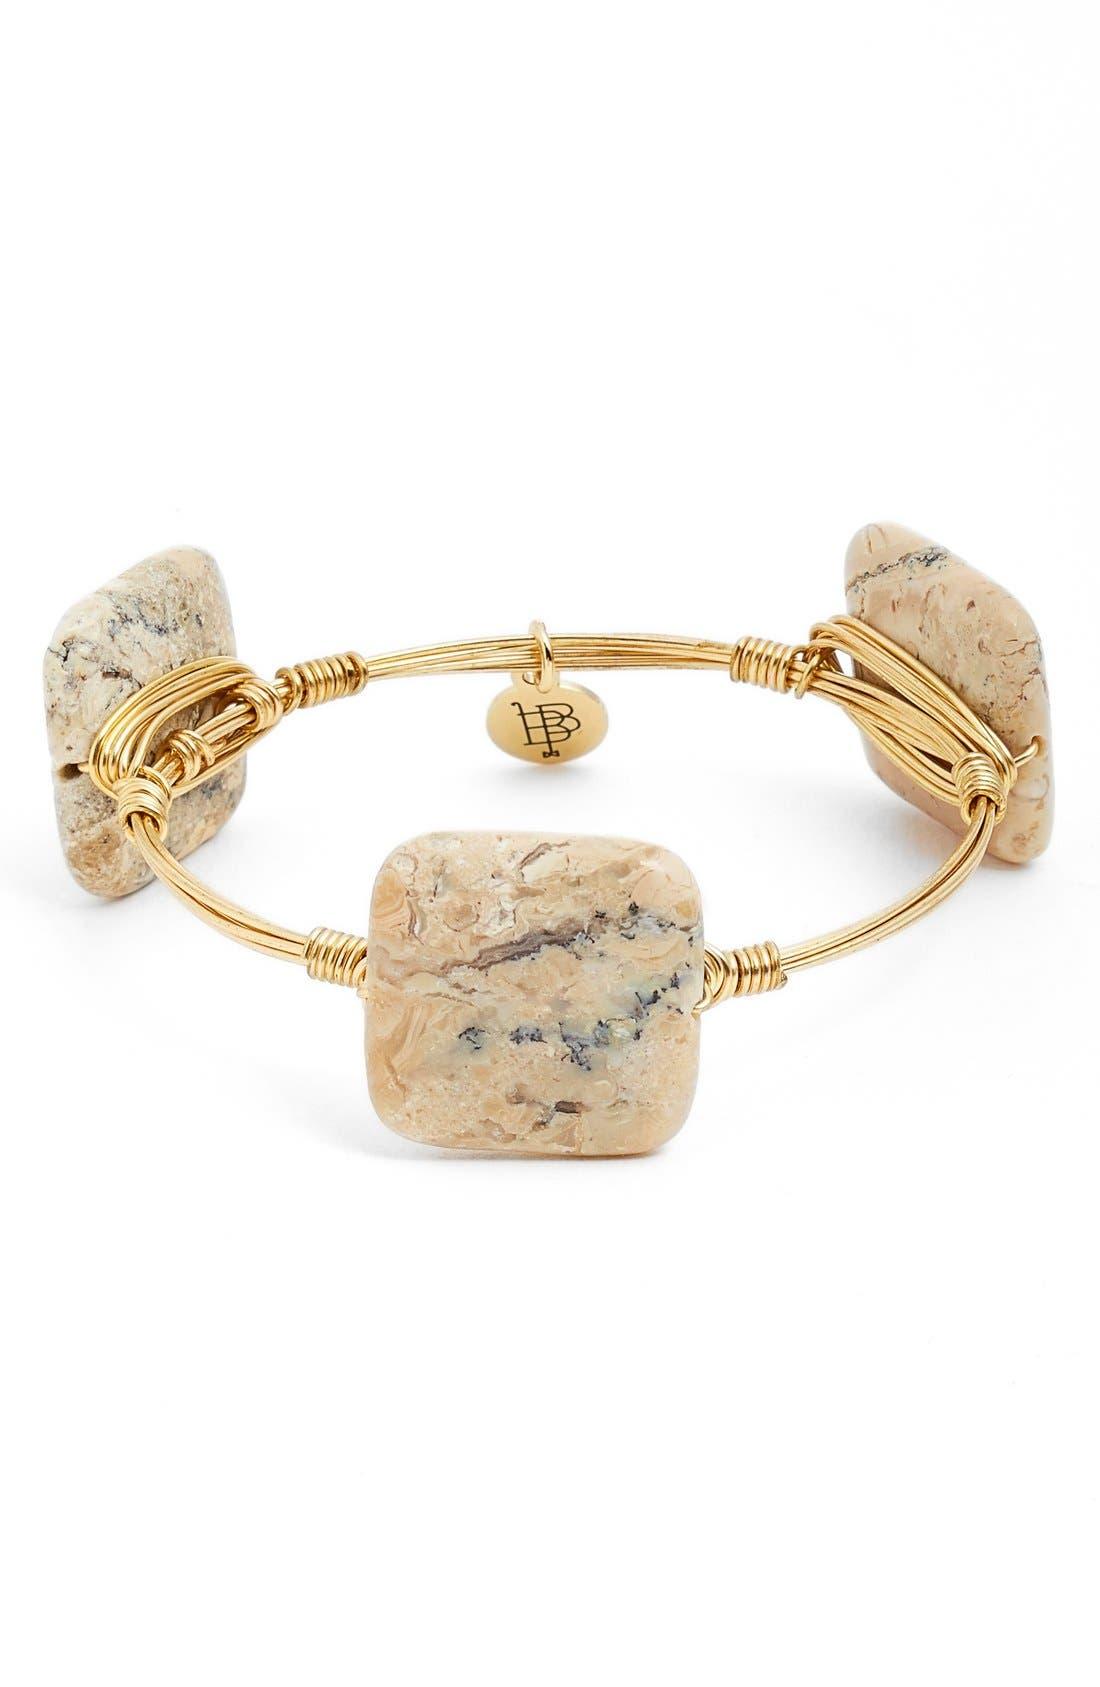 Main Image - Bourbon and Boweties SmallStone Bracelet